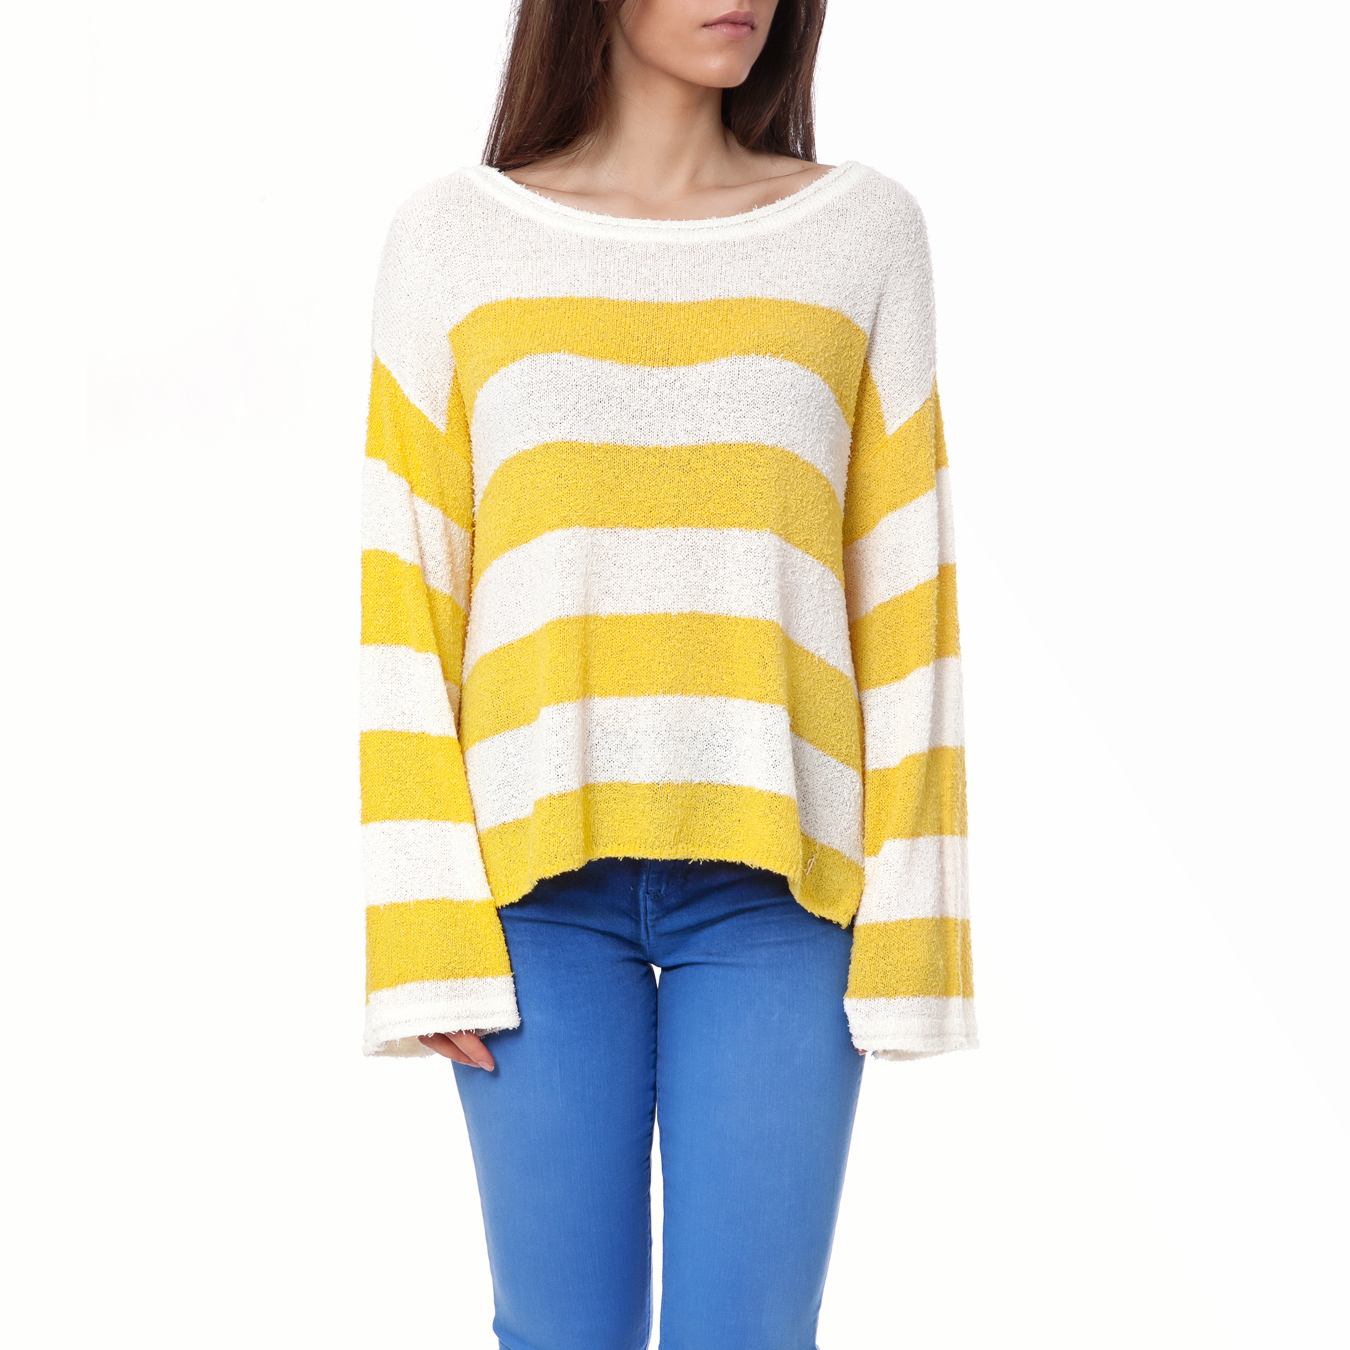 JUICY COUTURE - Γυναικείο πουλόβερ Juicy Couture κίτρινο γυναικεία ρούχα πλεκτά ζακέτες πουλόβερ